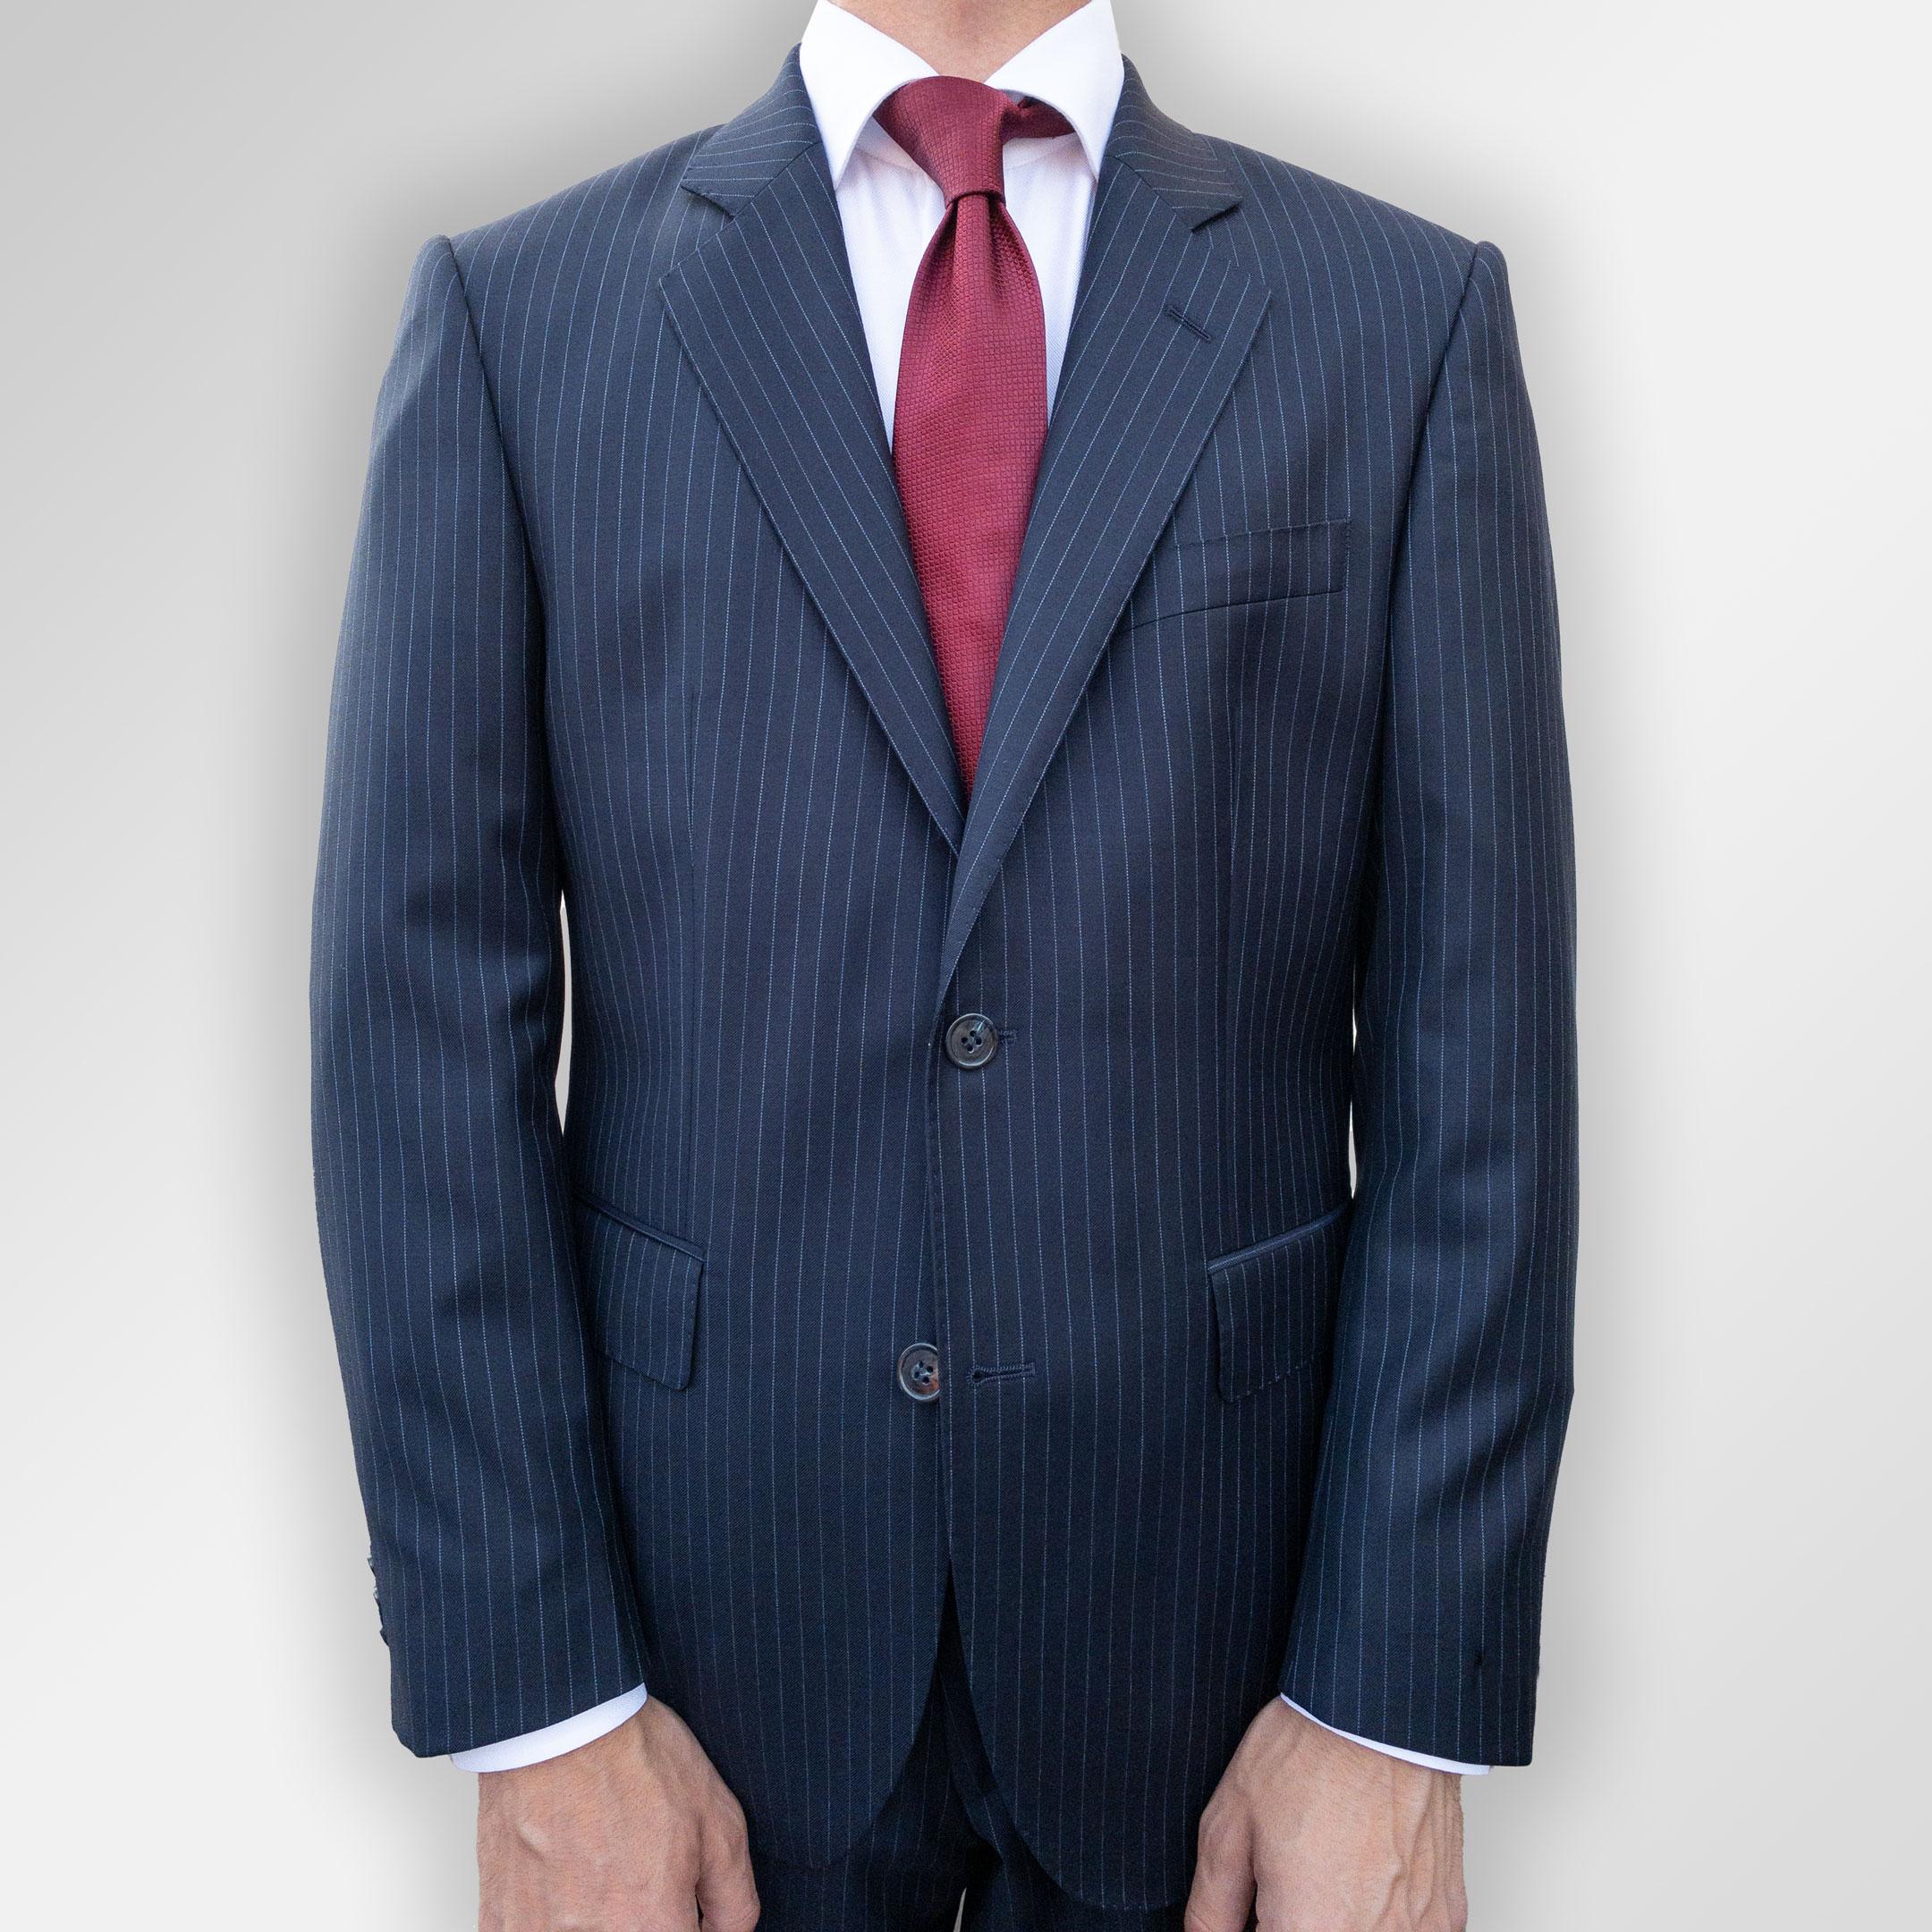 Dress, navy pinstripe